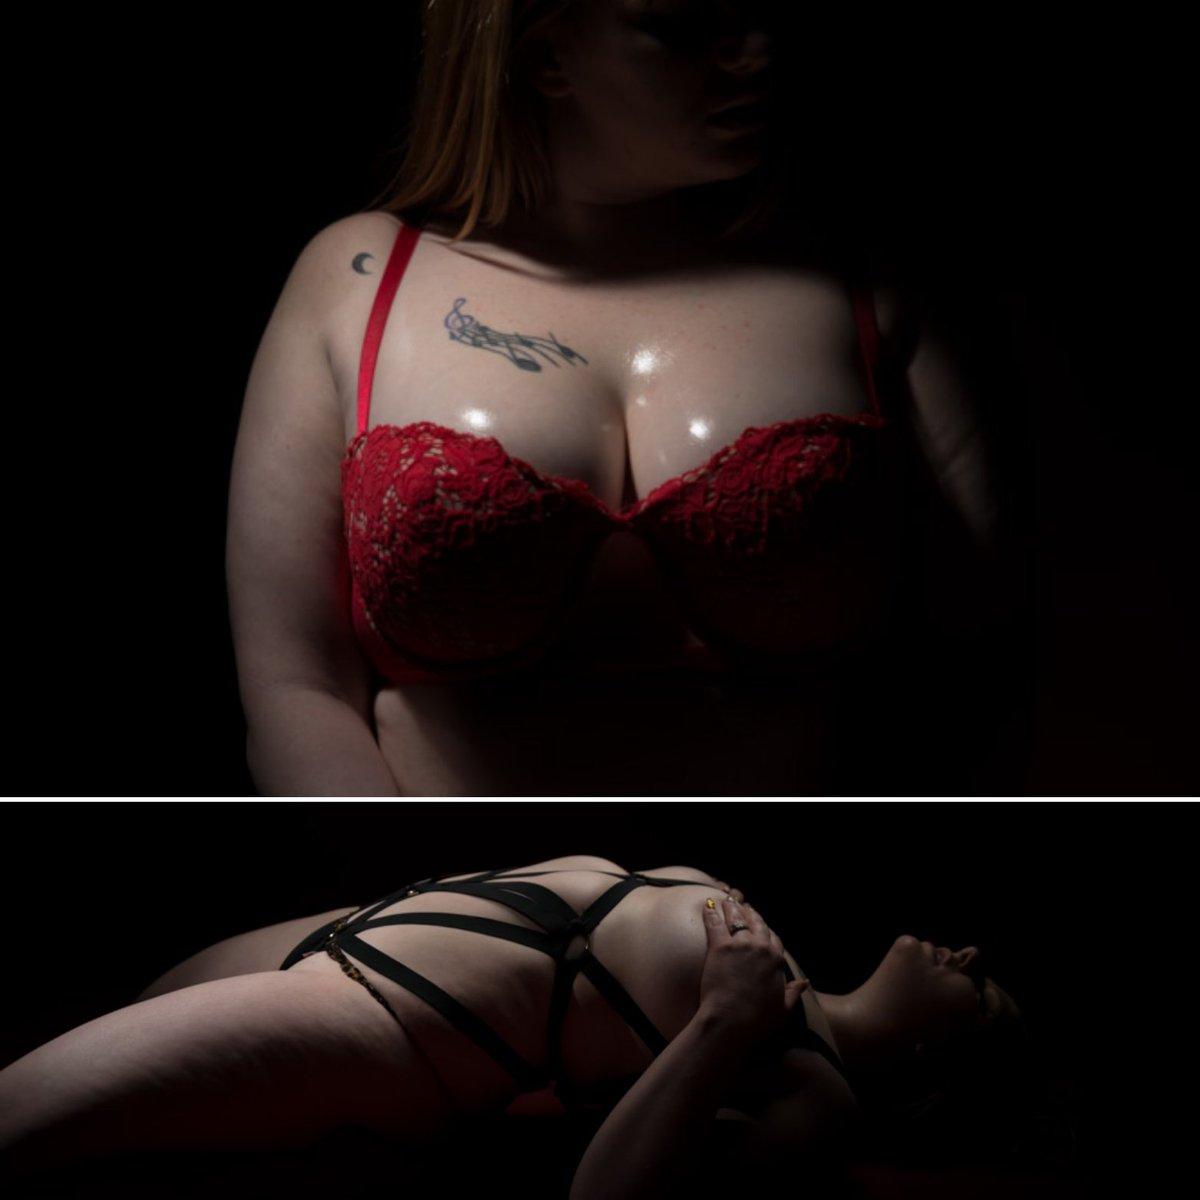 #bodyformphotography_bfp #piercedchicks #tattooedgirls #girlsofinstgram #chickswithtattoos #bodypositivity #tattoos_of_instagram  #curvygirl #bodypositive #curvymodelpic.twitter.com/NZxIwSCMbT